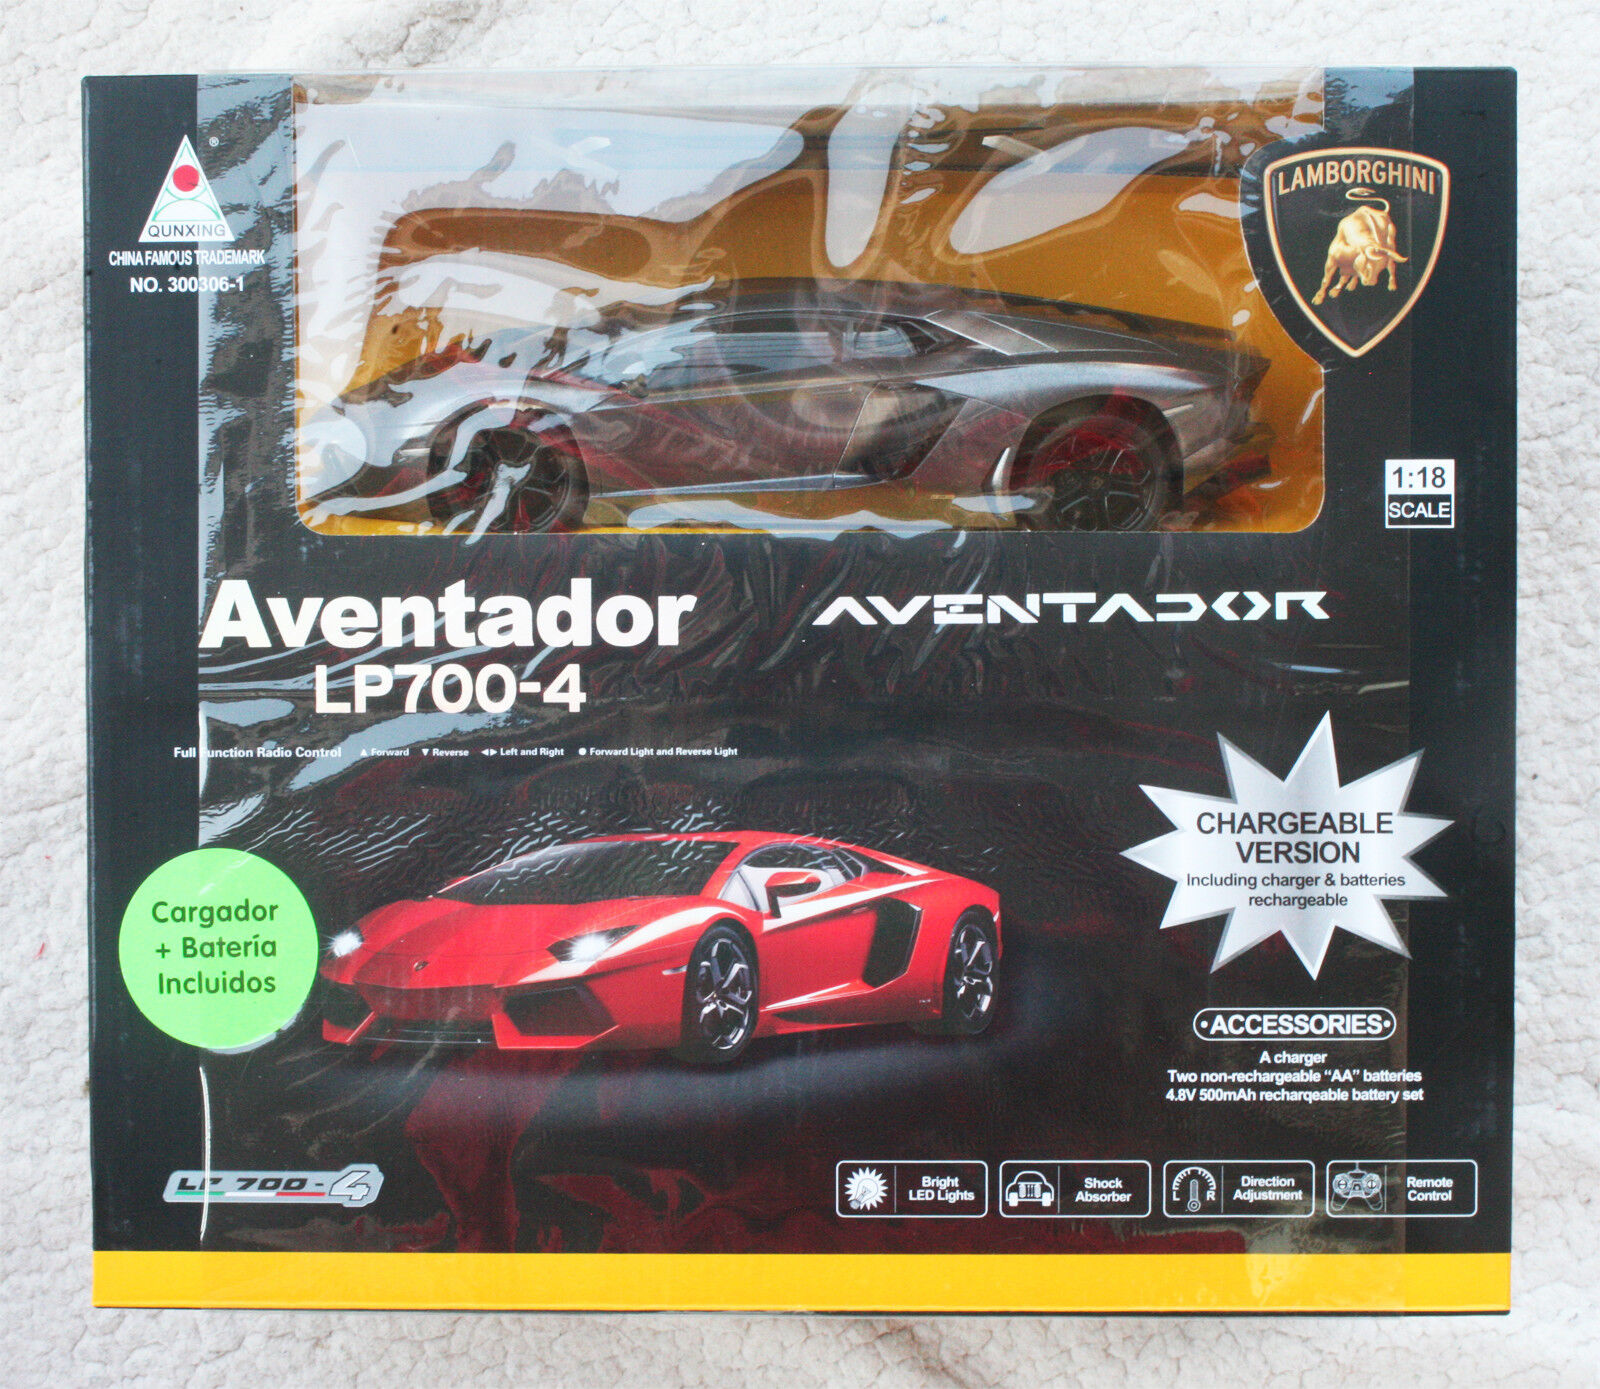 Lamborghini aventador lp700-4, kostenpflichtigen version 1,18.sehr selten - box, neue